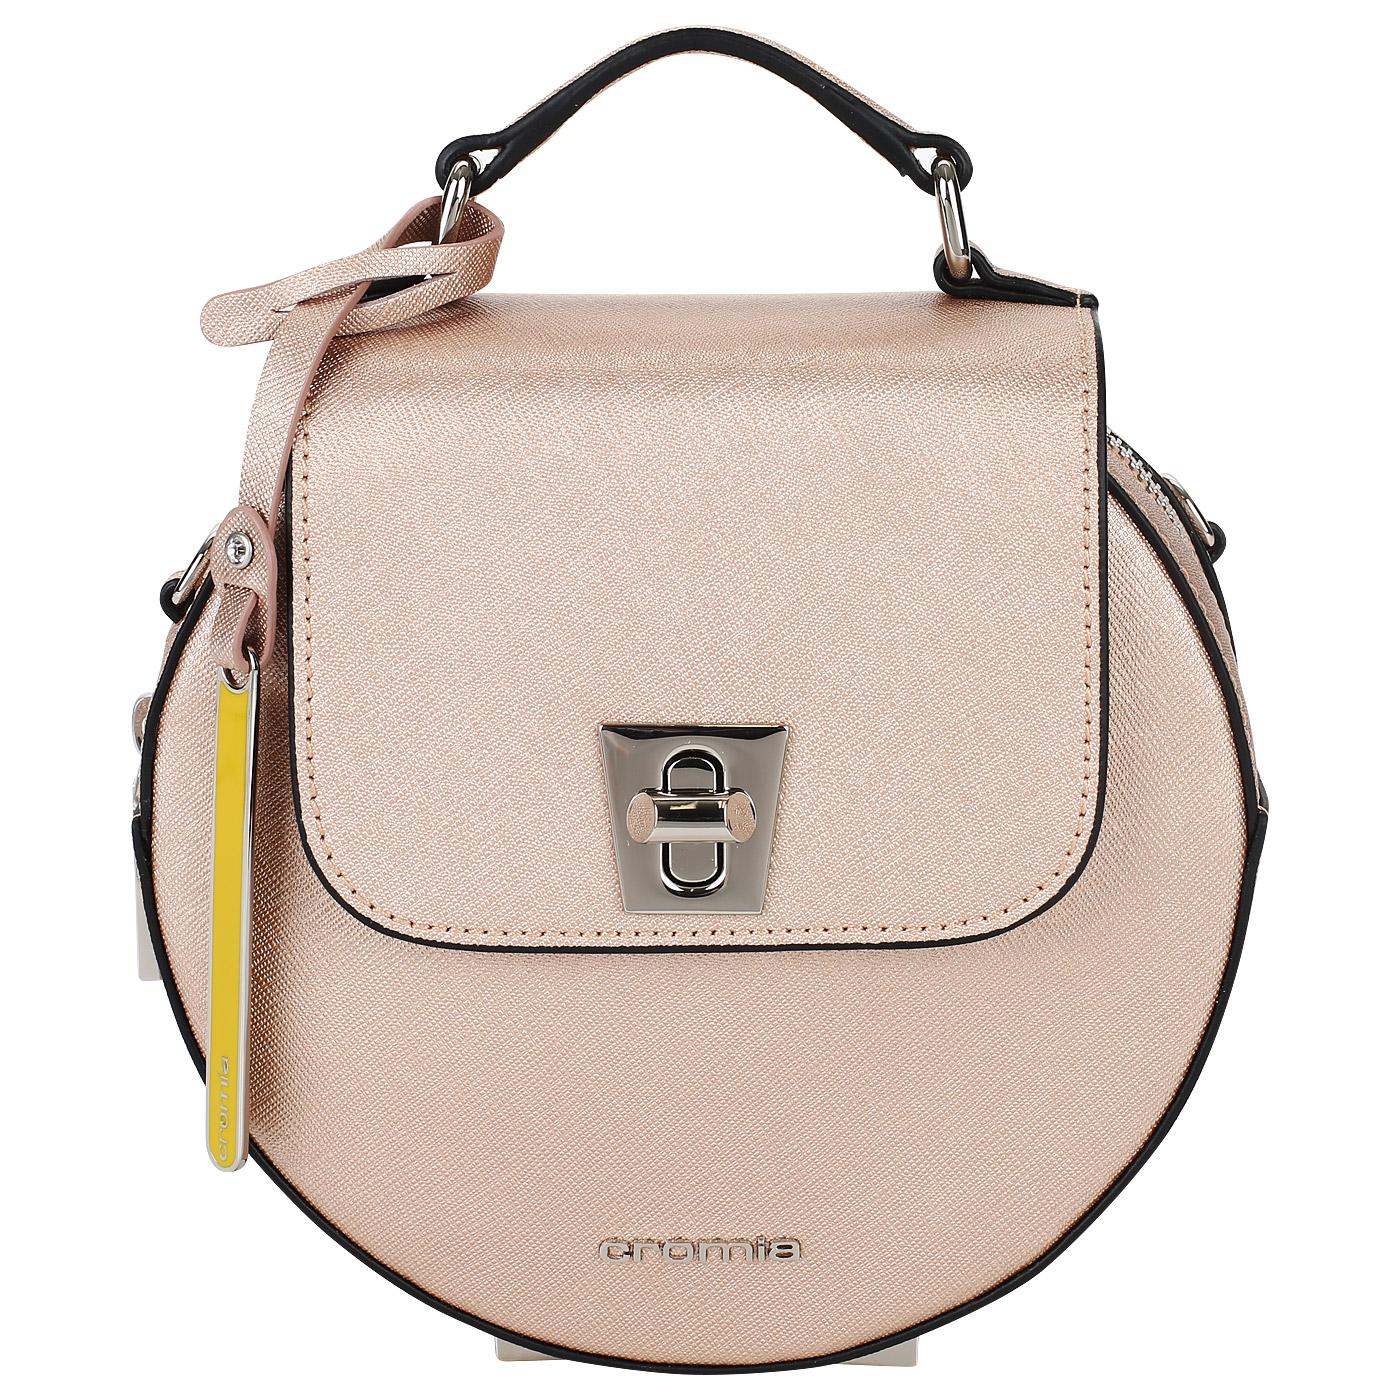 a5e9448a6c33 Круглая сумочка через плечо Cromia Perla Круглая сумочка через плечо Cromia  Perla ...